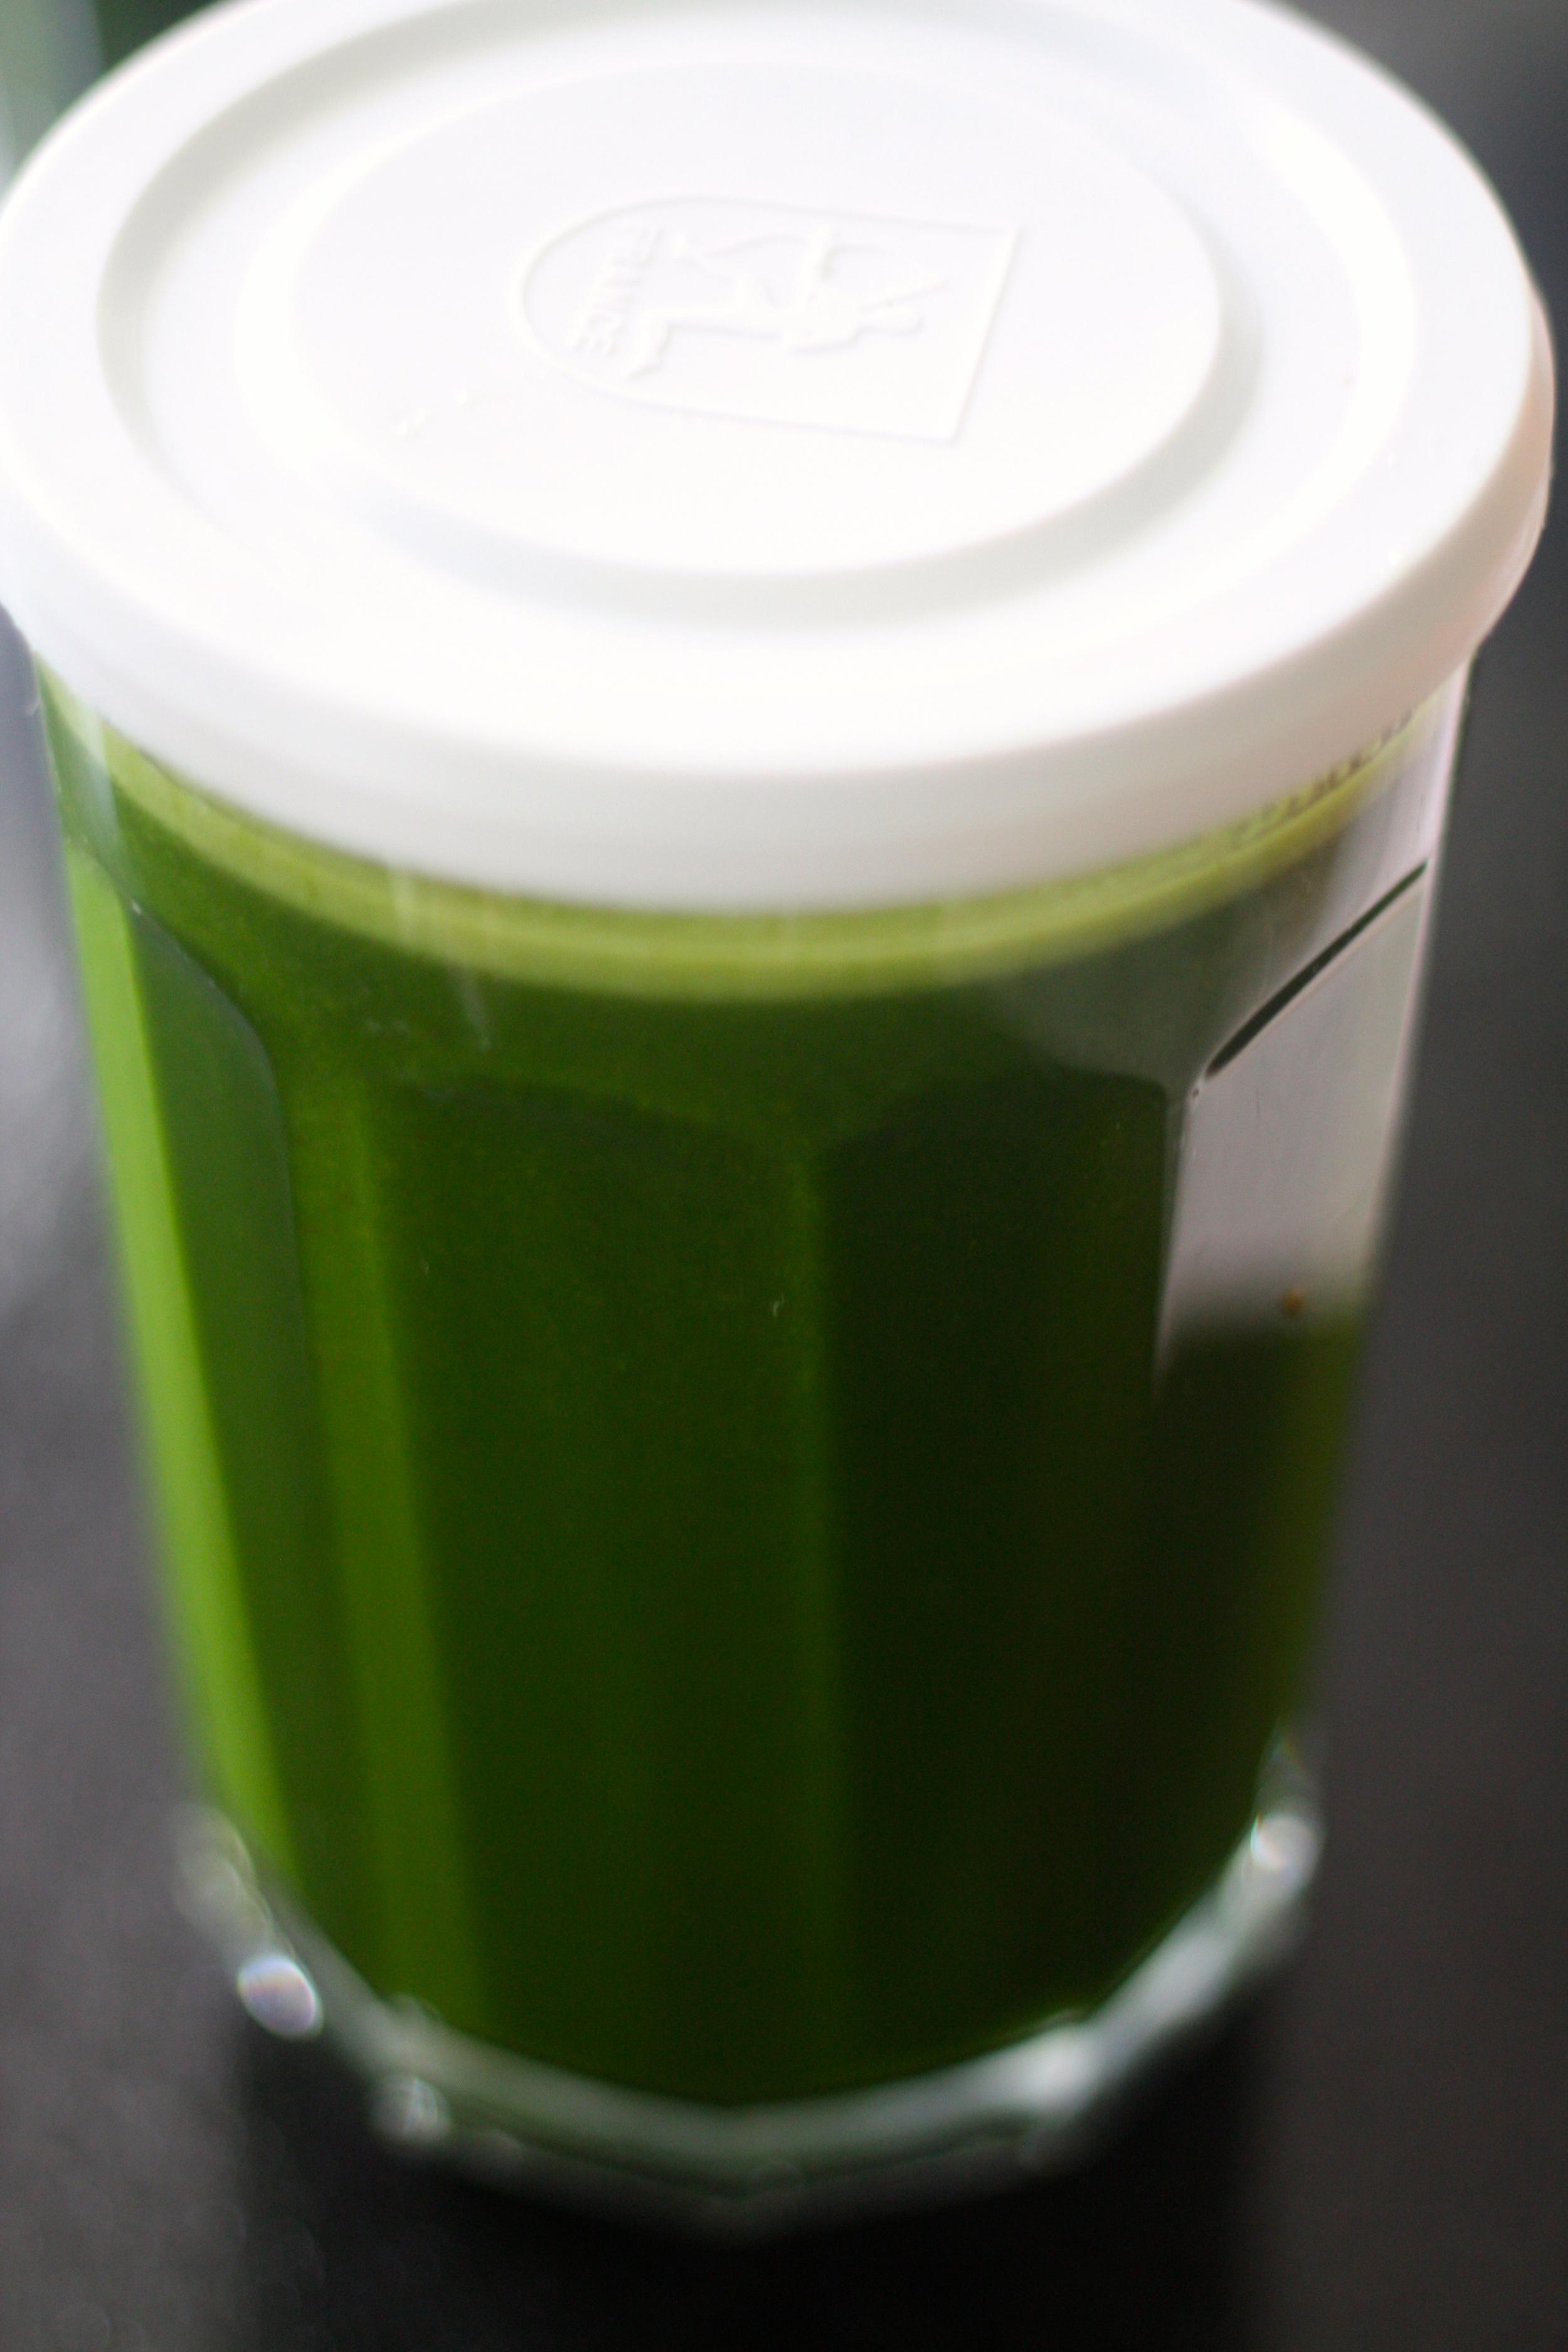 kale-pineapple detox juice